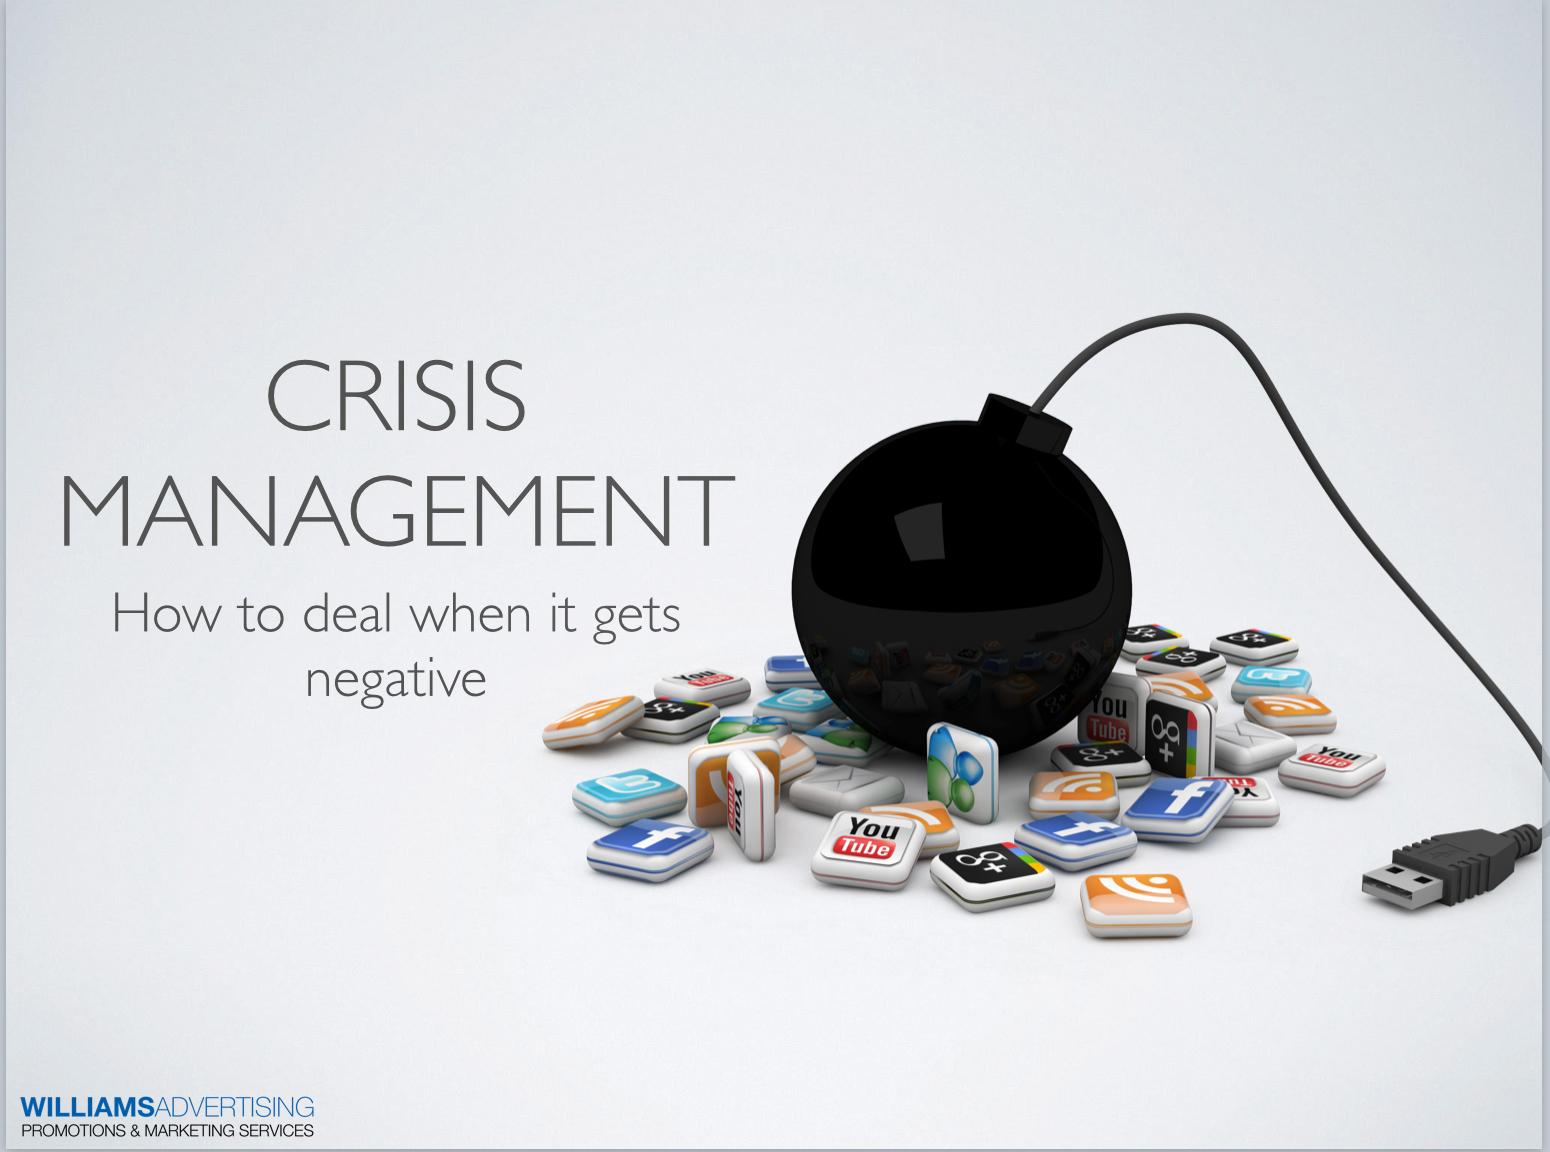 WilliamsAdvertisingCrisisManagementSocial